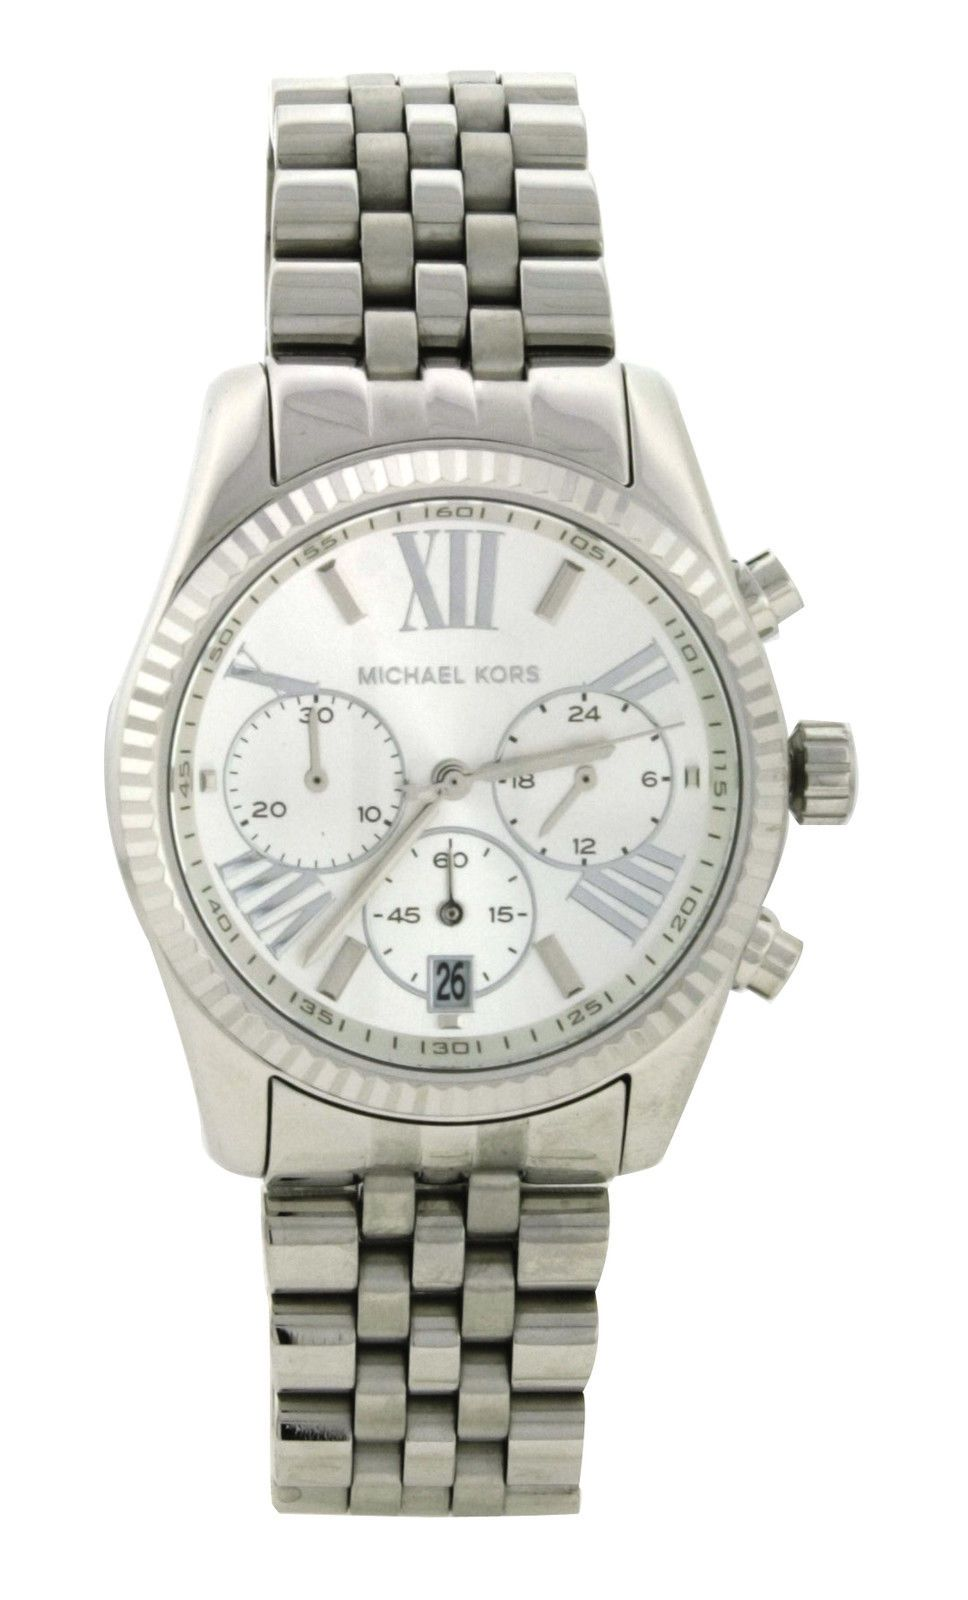 695a3f1ffe91 Michael Kors MK 5555 Lexington Silver Chronograph Stainless Steel Women s  Watch